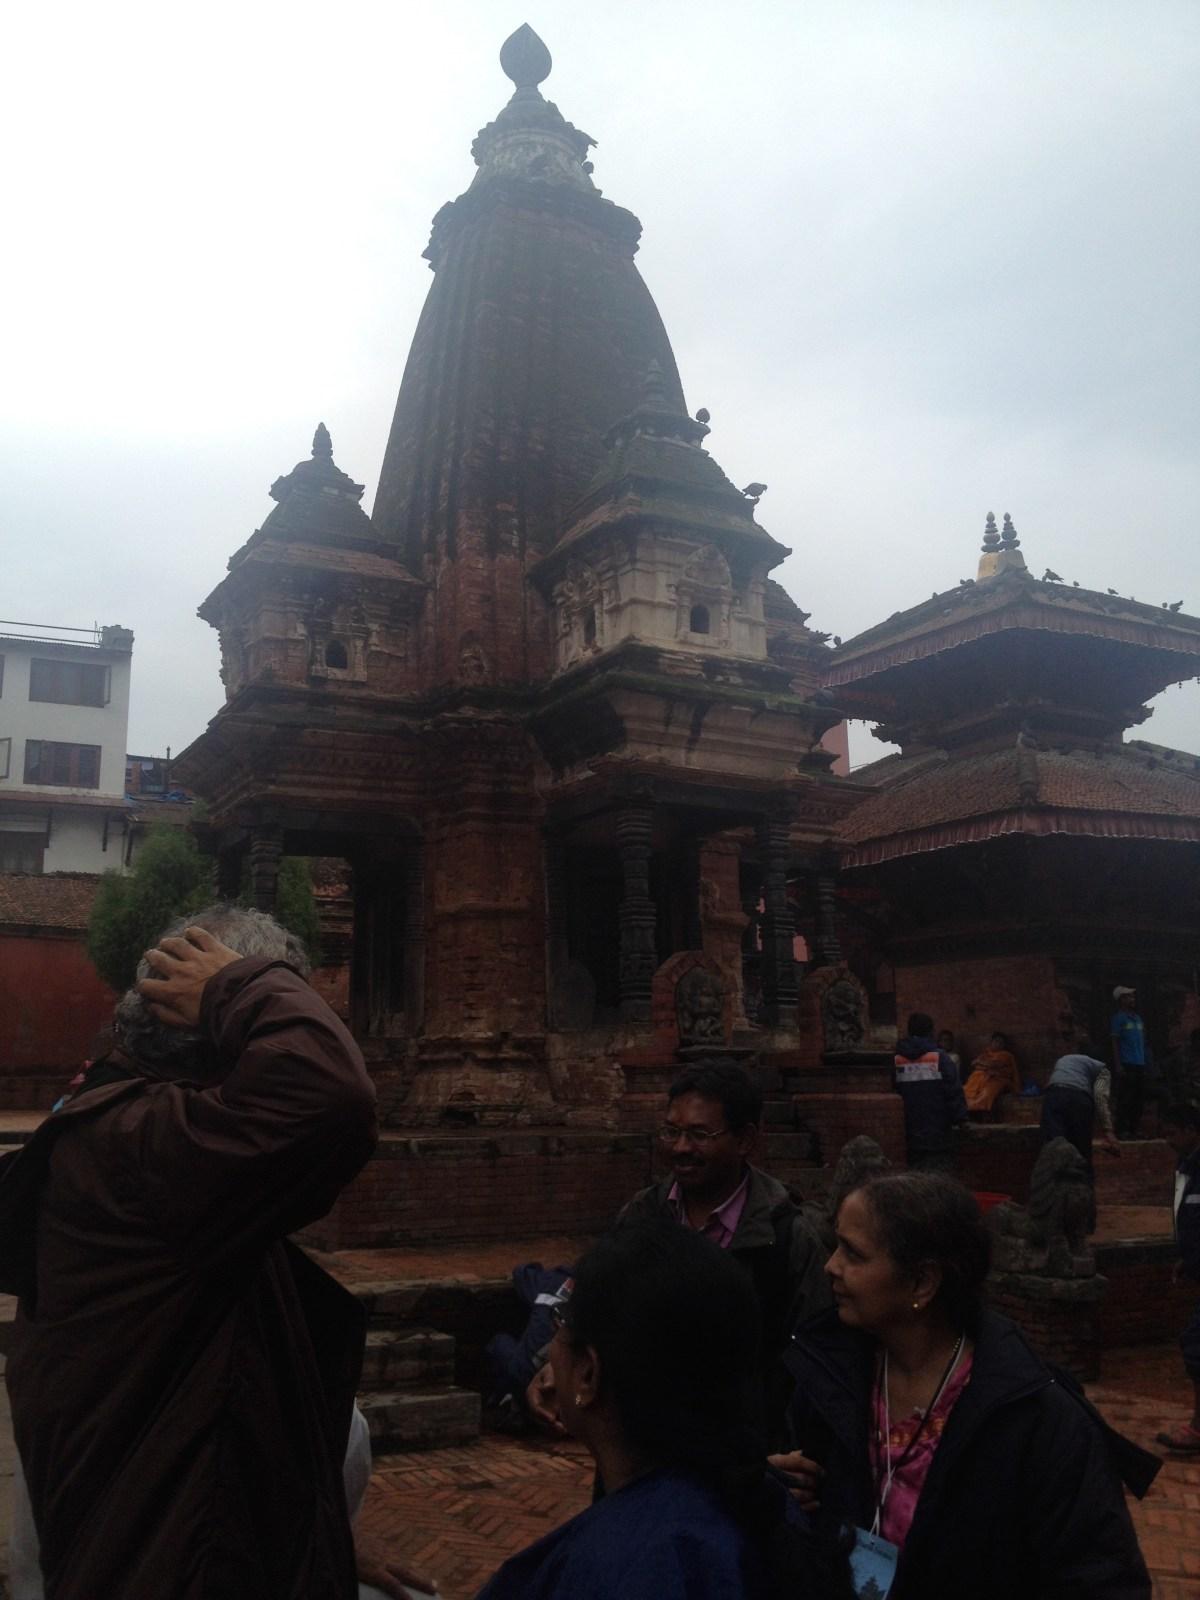 Nepal Travel: Entrance to Durbar Square Kathmandu